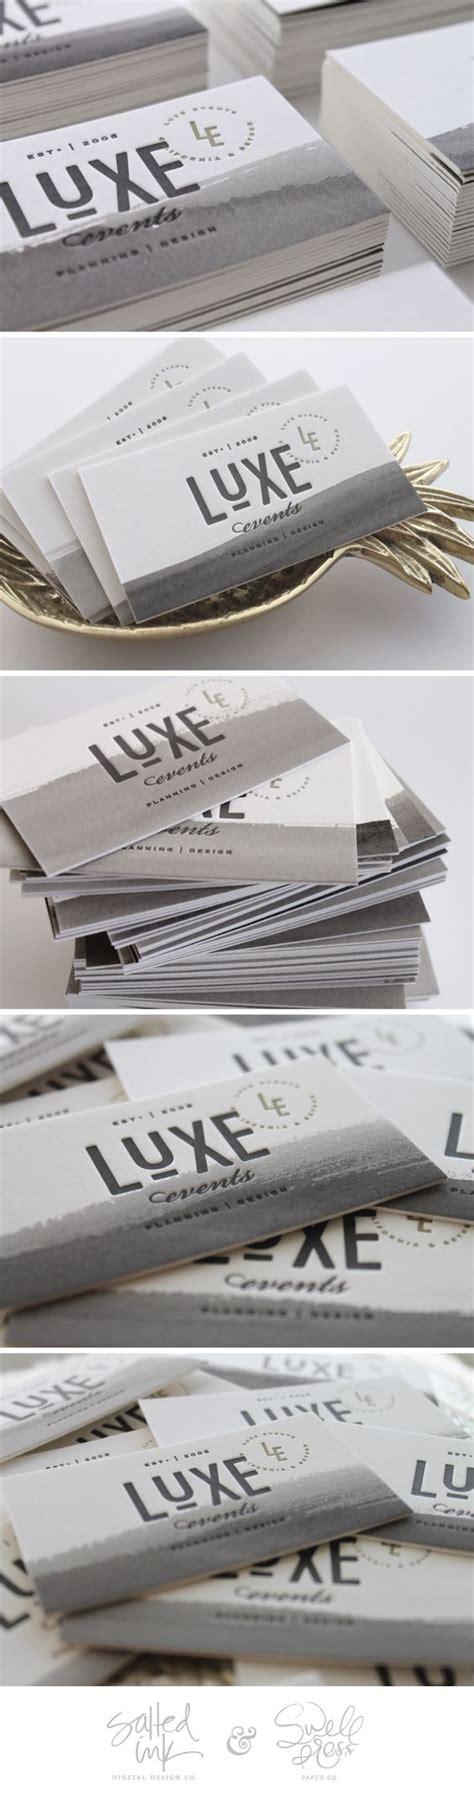 design luxe event co business card design logo designer bradenton web design